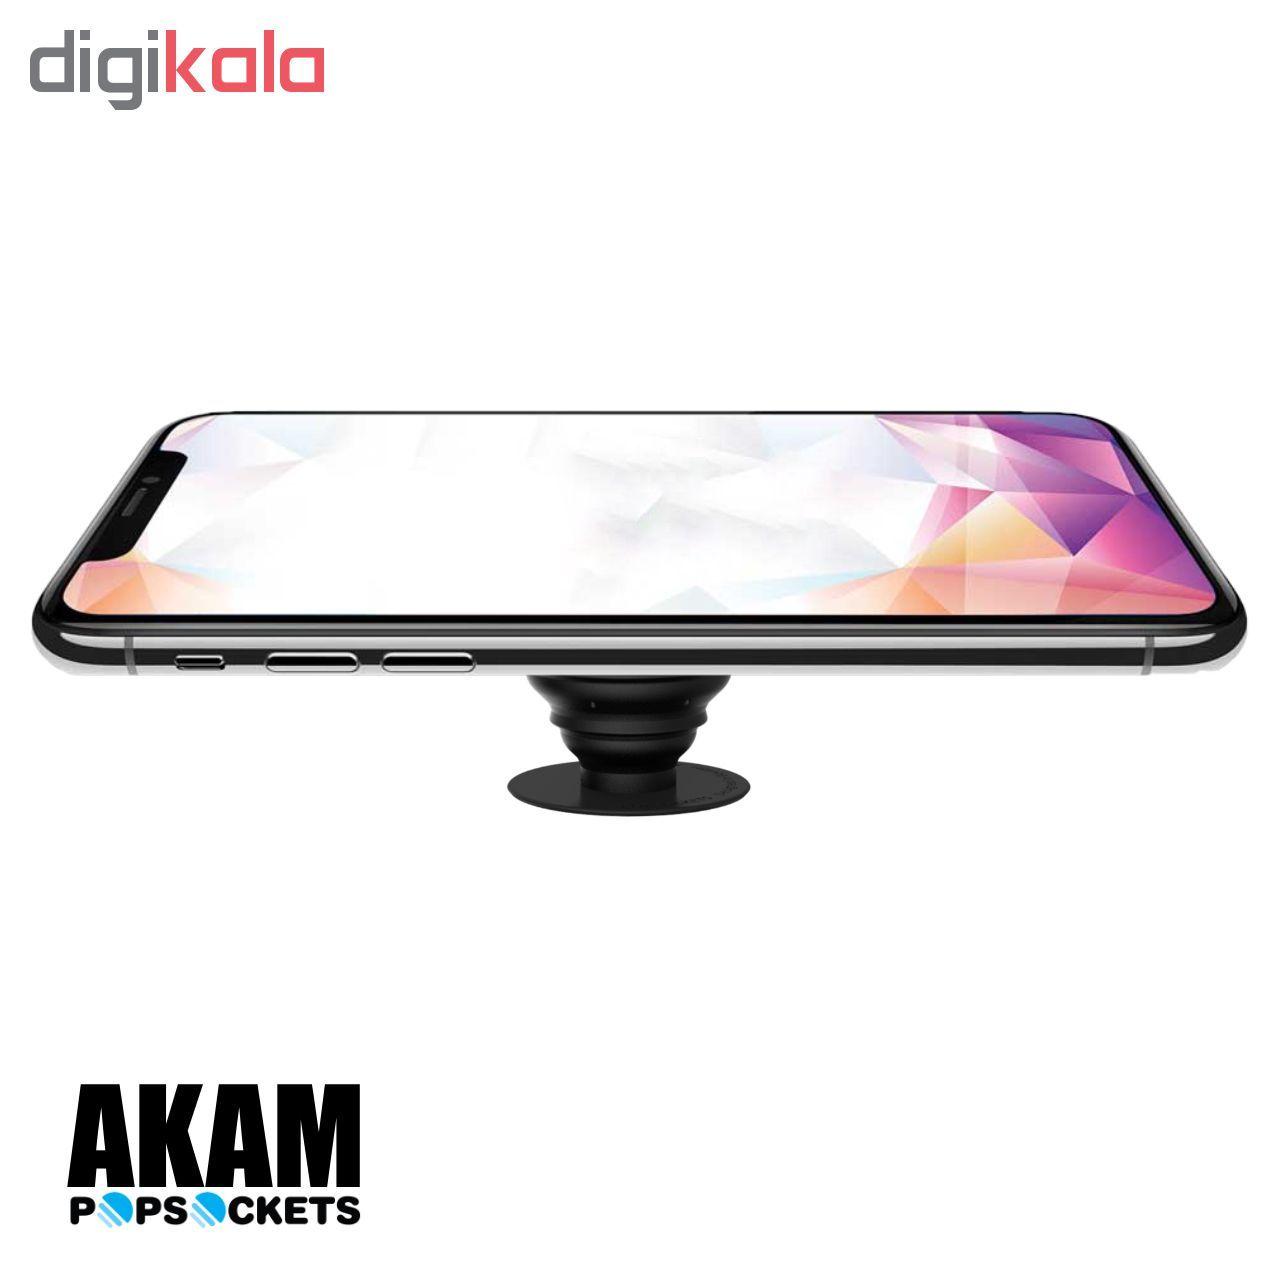 پایه نگهدارنده گوشی  موبایل پاپ سوکت آکام مدل APS0014 main 1 6